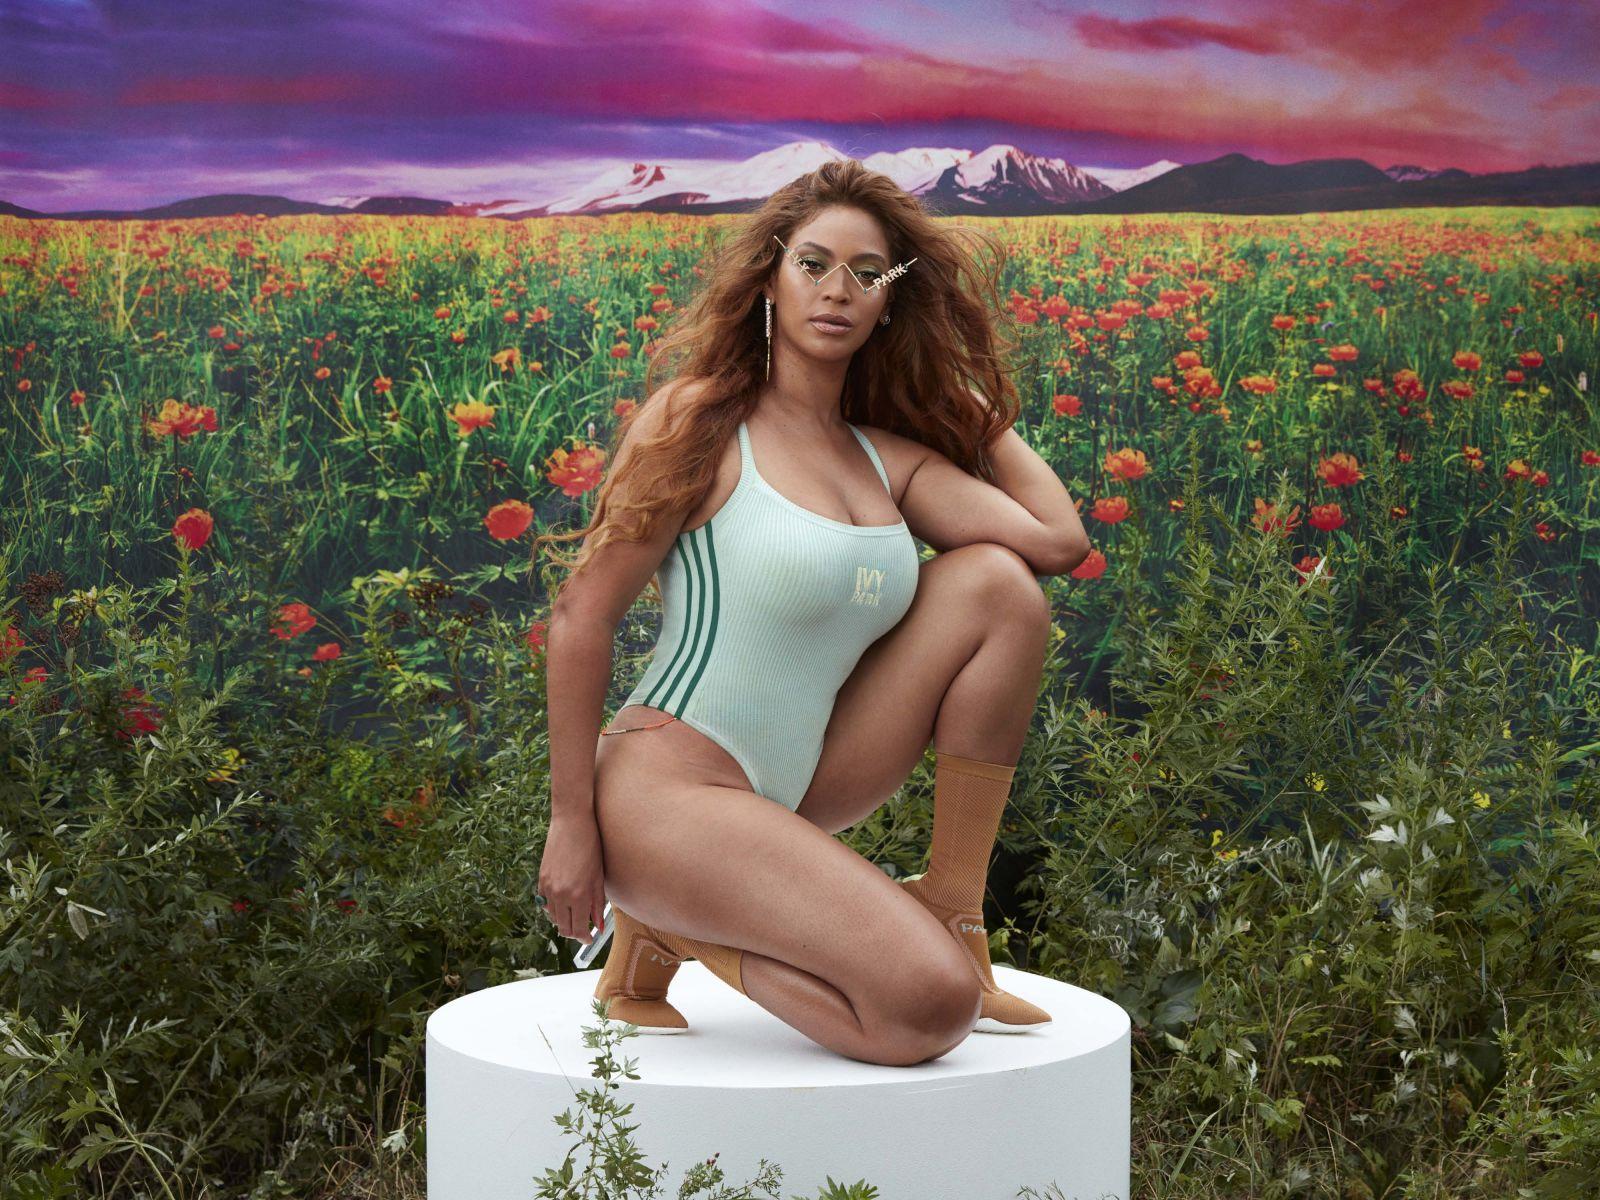 Diva, kráľovná festivalu Coachella, ale tiež podvedená matka troch detí. Beyoncé určuje módne trendy a podporuje selflove